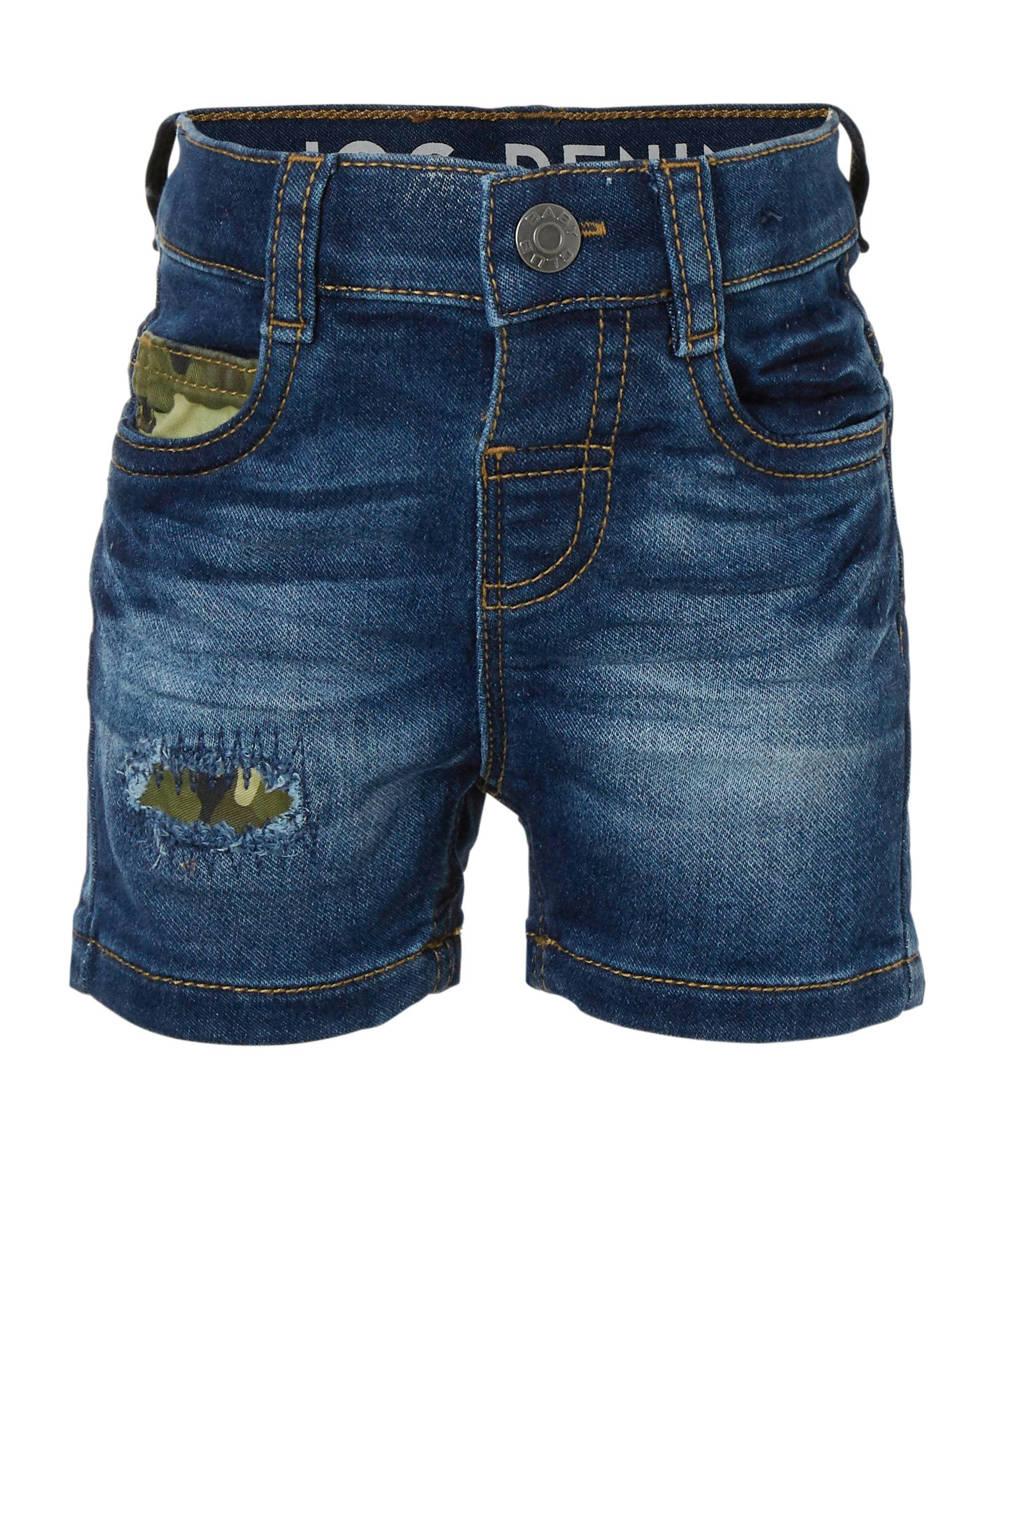 C&A Baby Club jeans bermuda met printopdruk, Dark denim